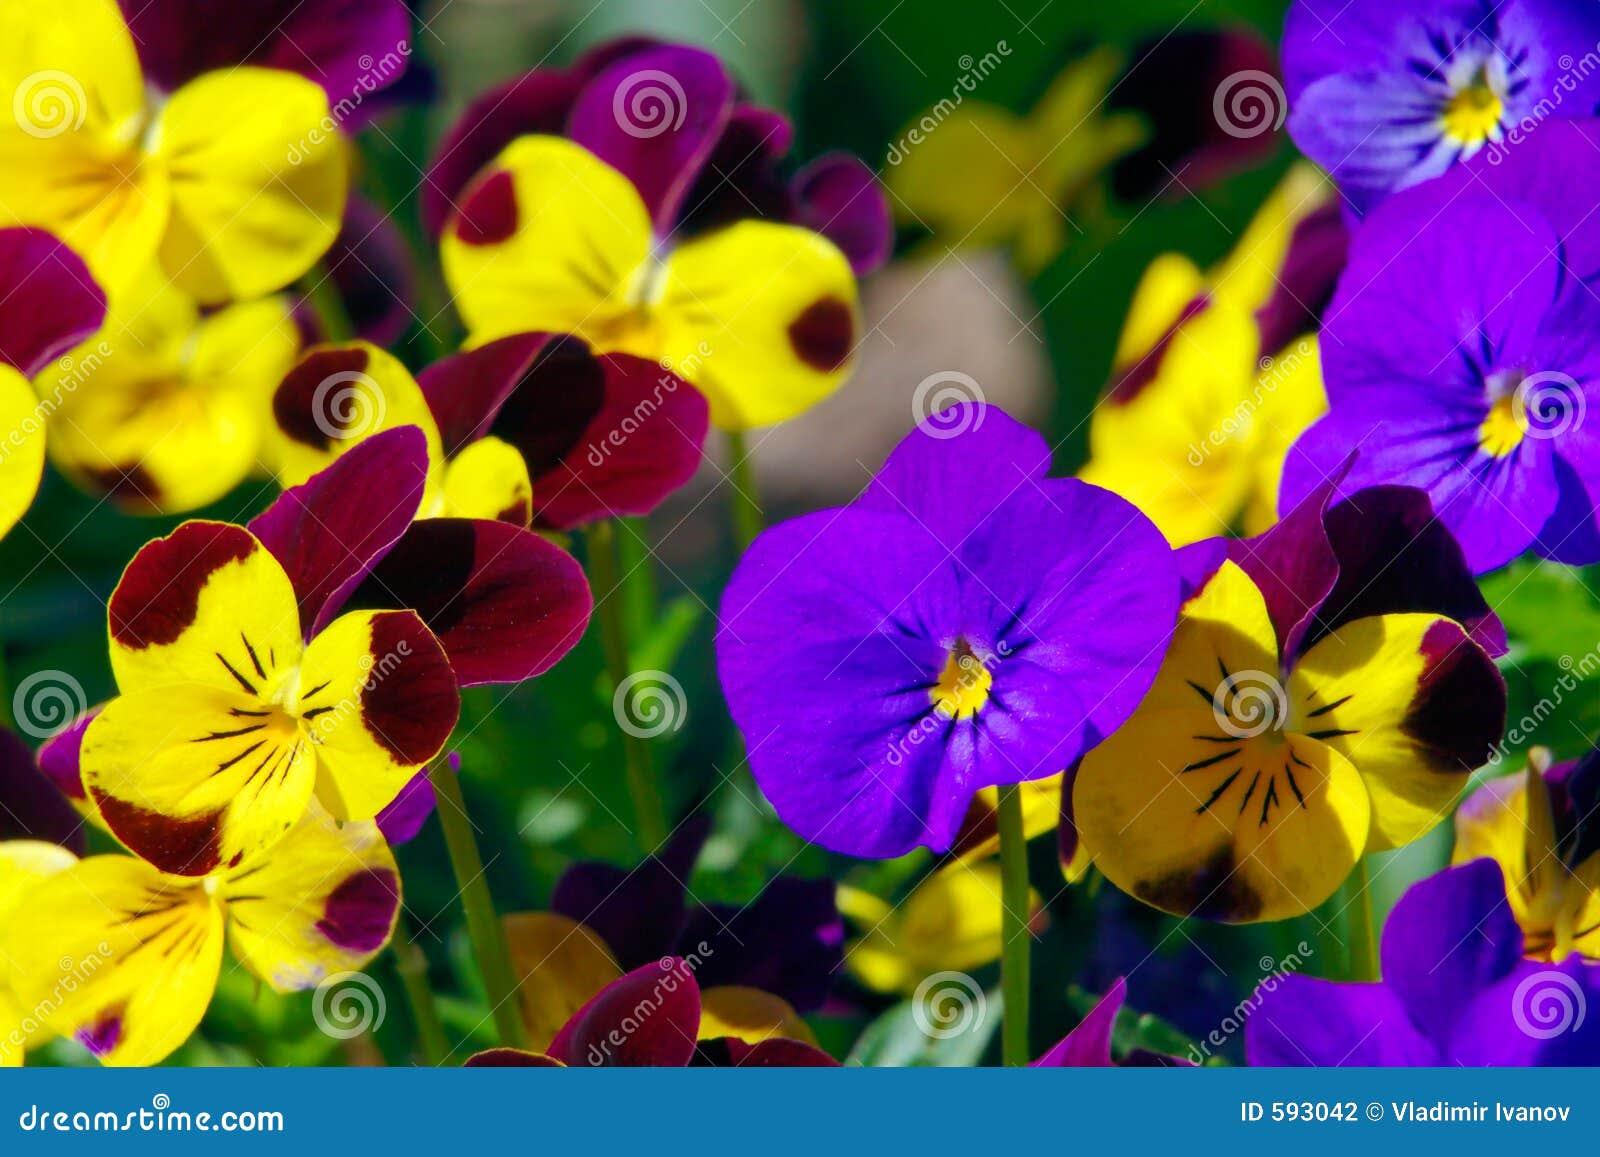 spring flowers 593042